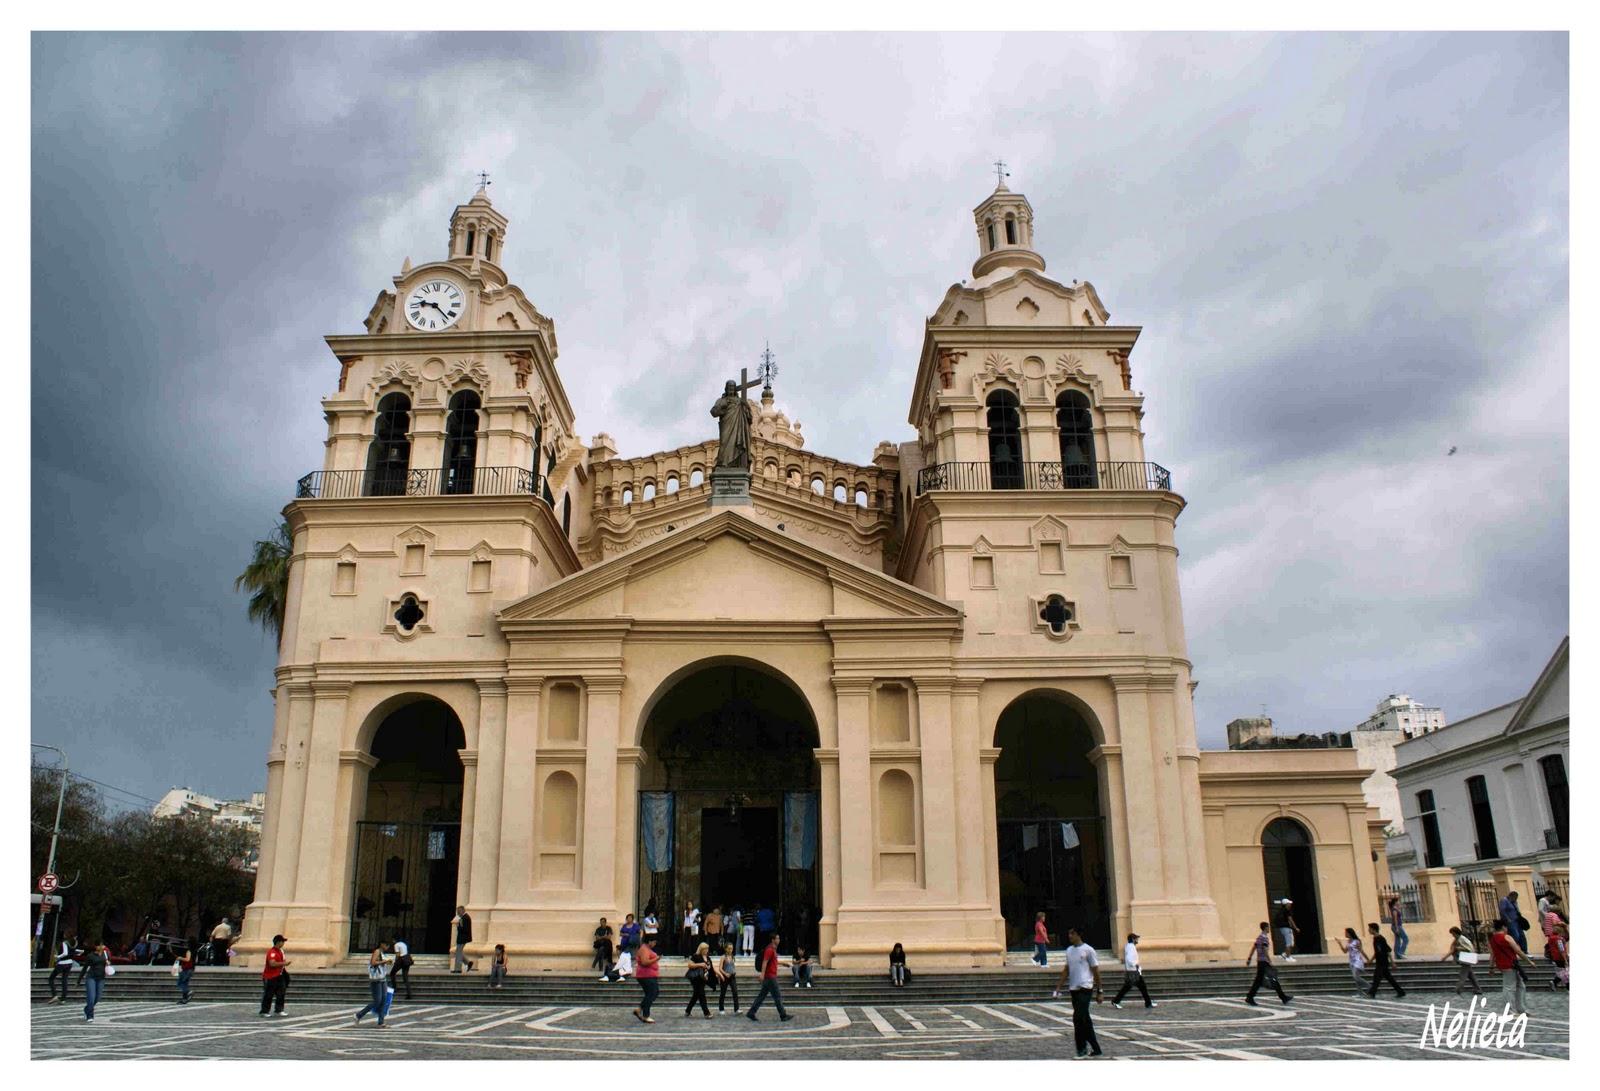 Arquitectura arte sacro y liturgia principi ispiratori for Arquitectura sacro